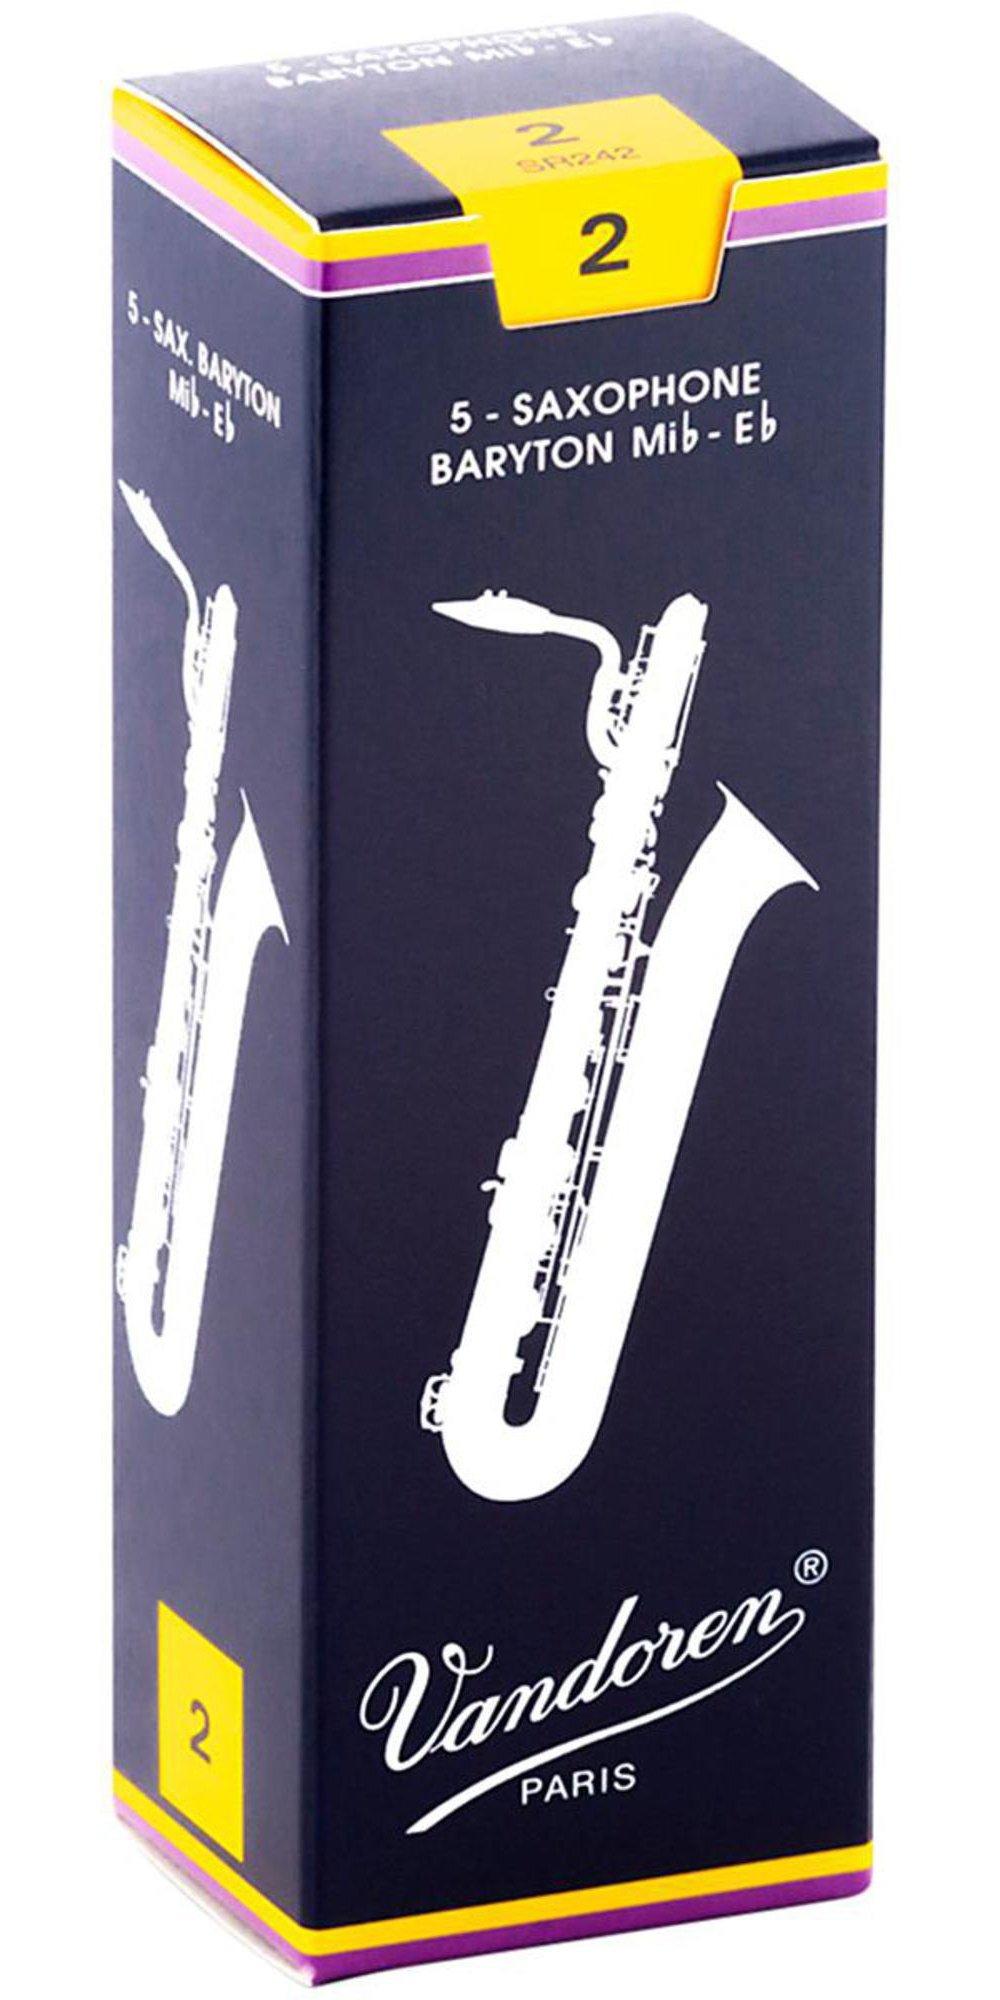 Vandoren Baritone Saxophone Reeds Strength 2 Box of 5